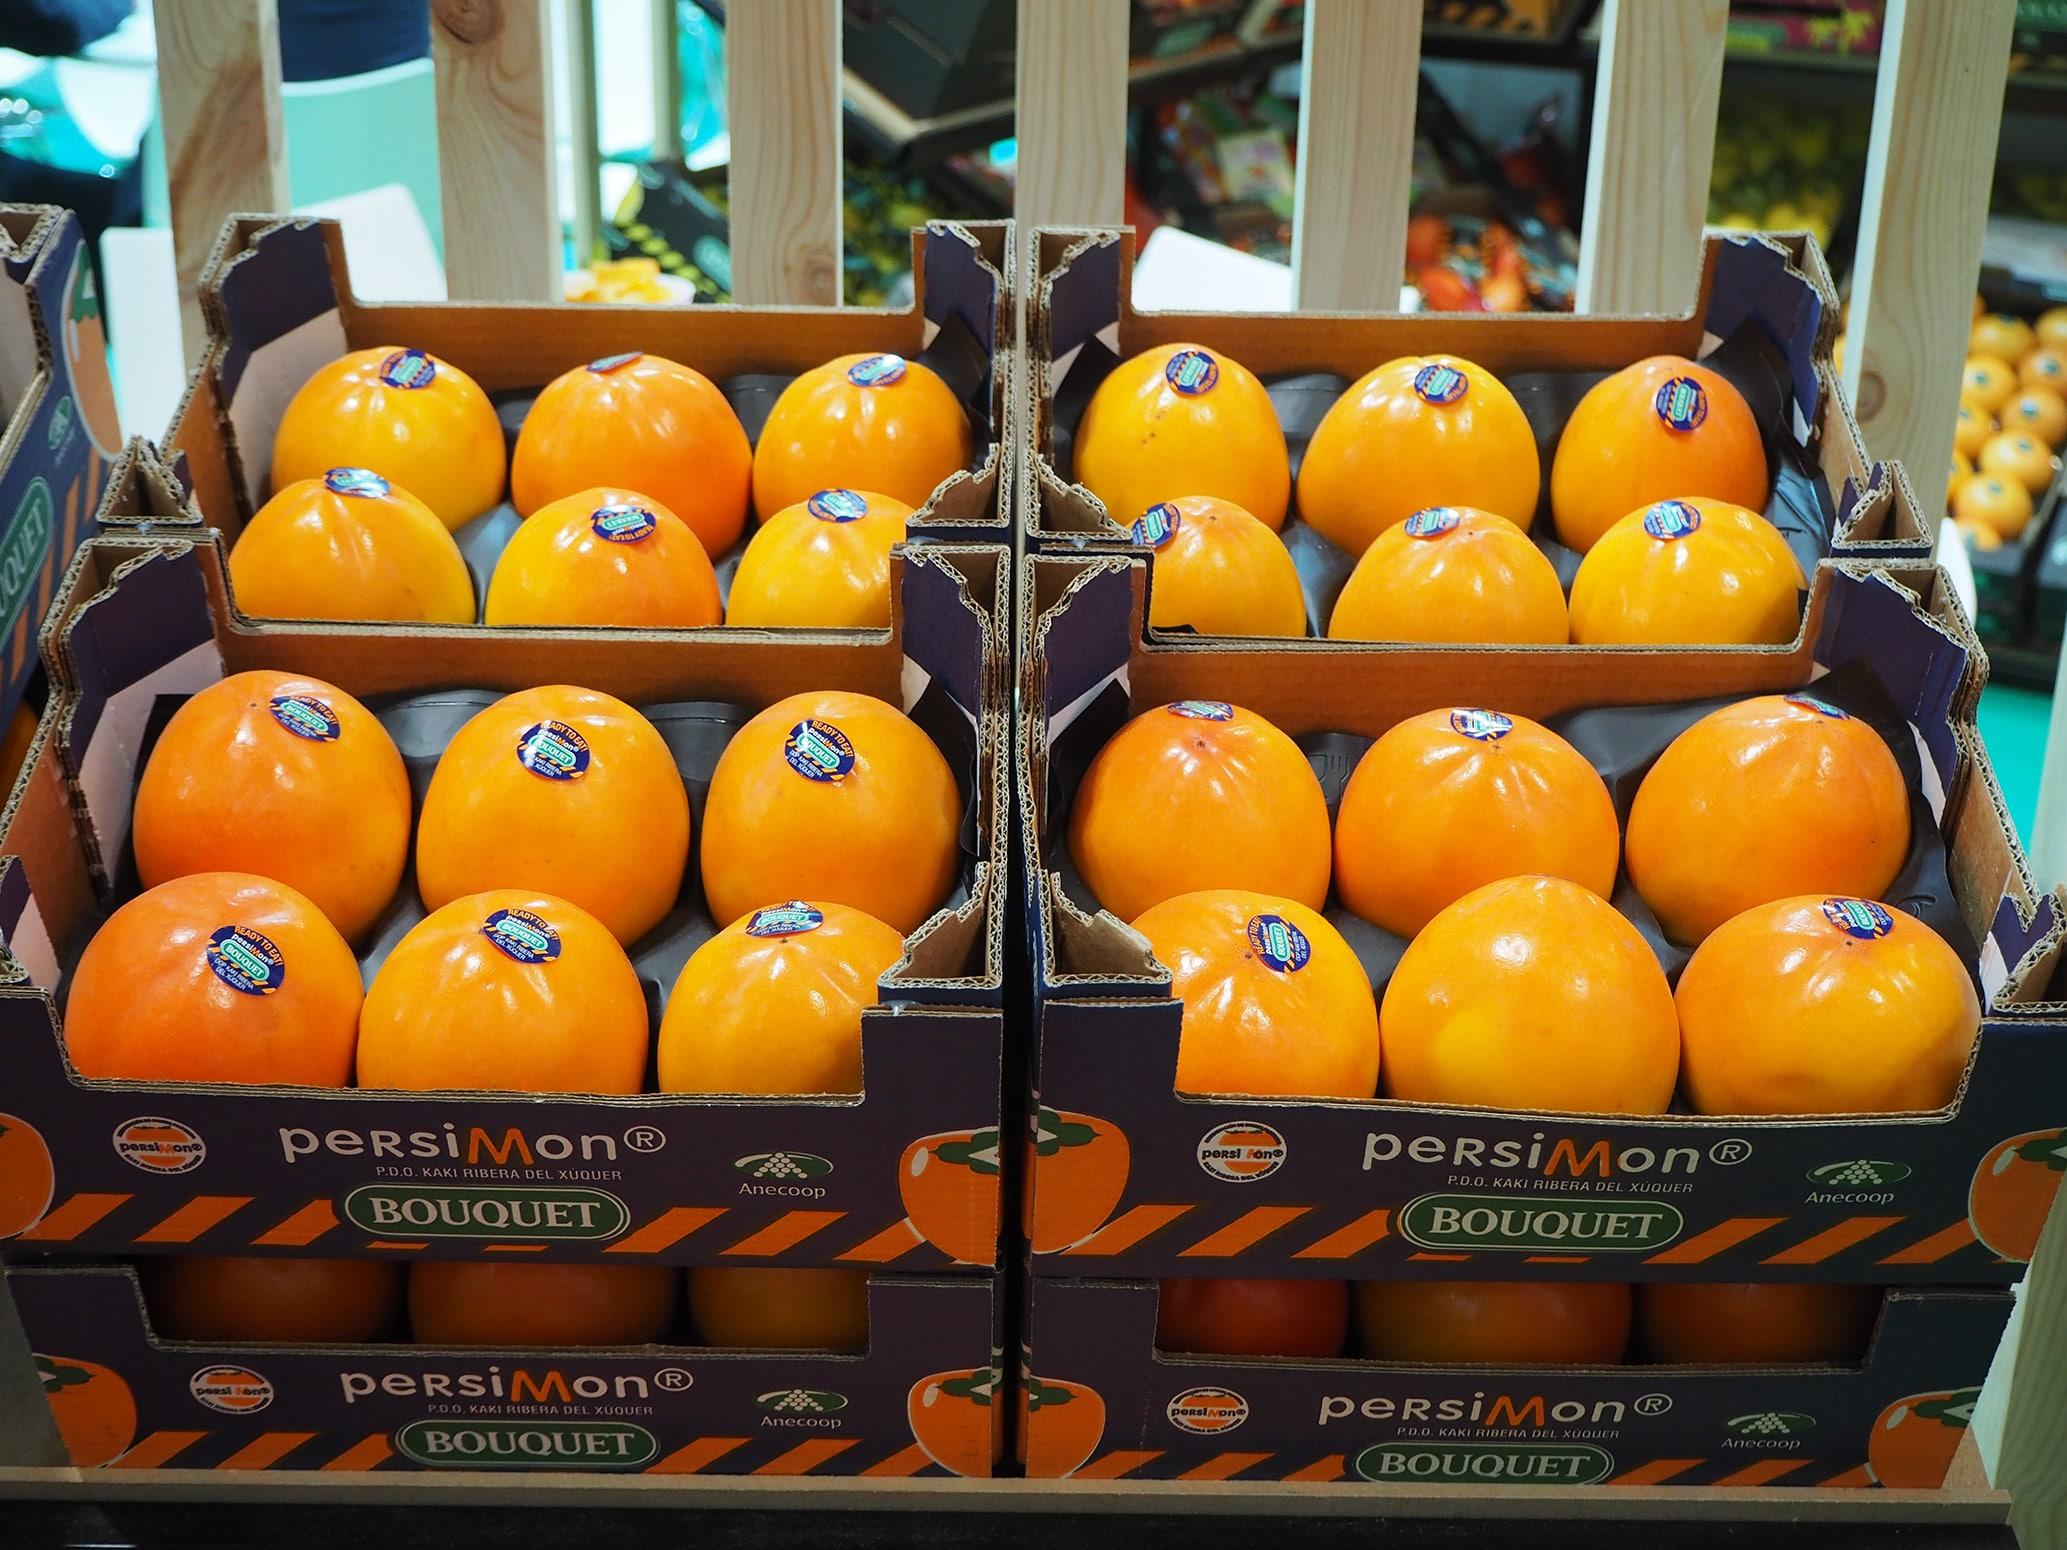 Spanish citrus and persimmon gain access to Peruvian market